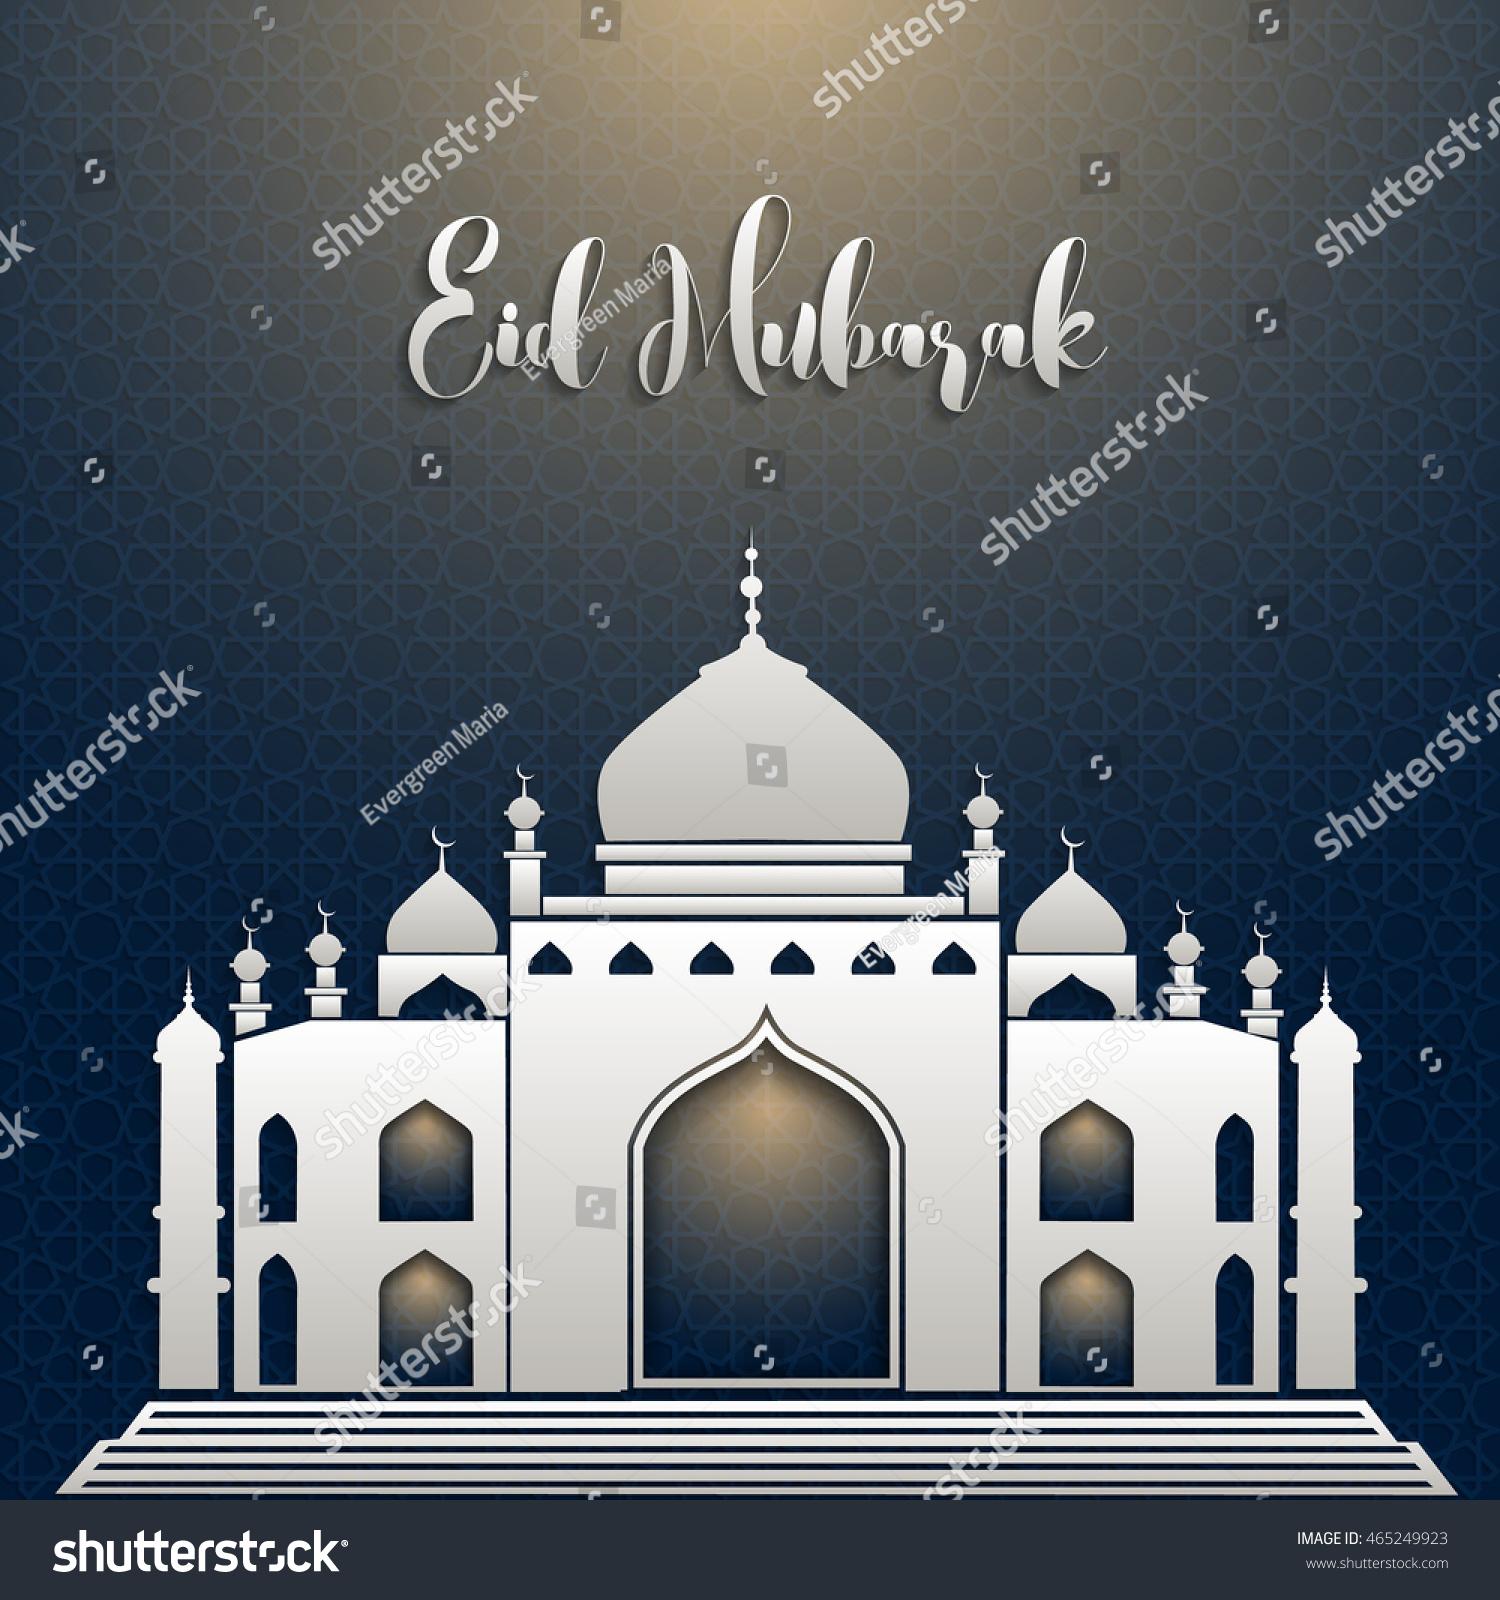 Eid Mubarak Arabic Calligraphy Eid Ul Adha Beautiful Greeting Card